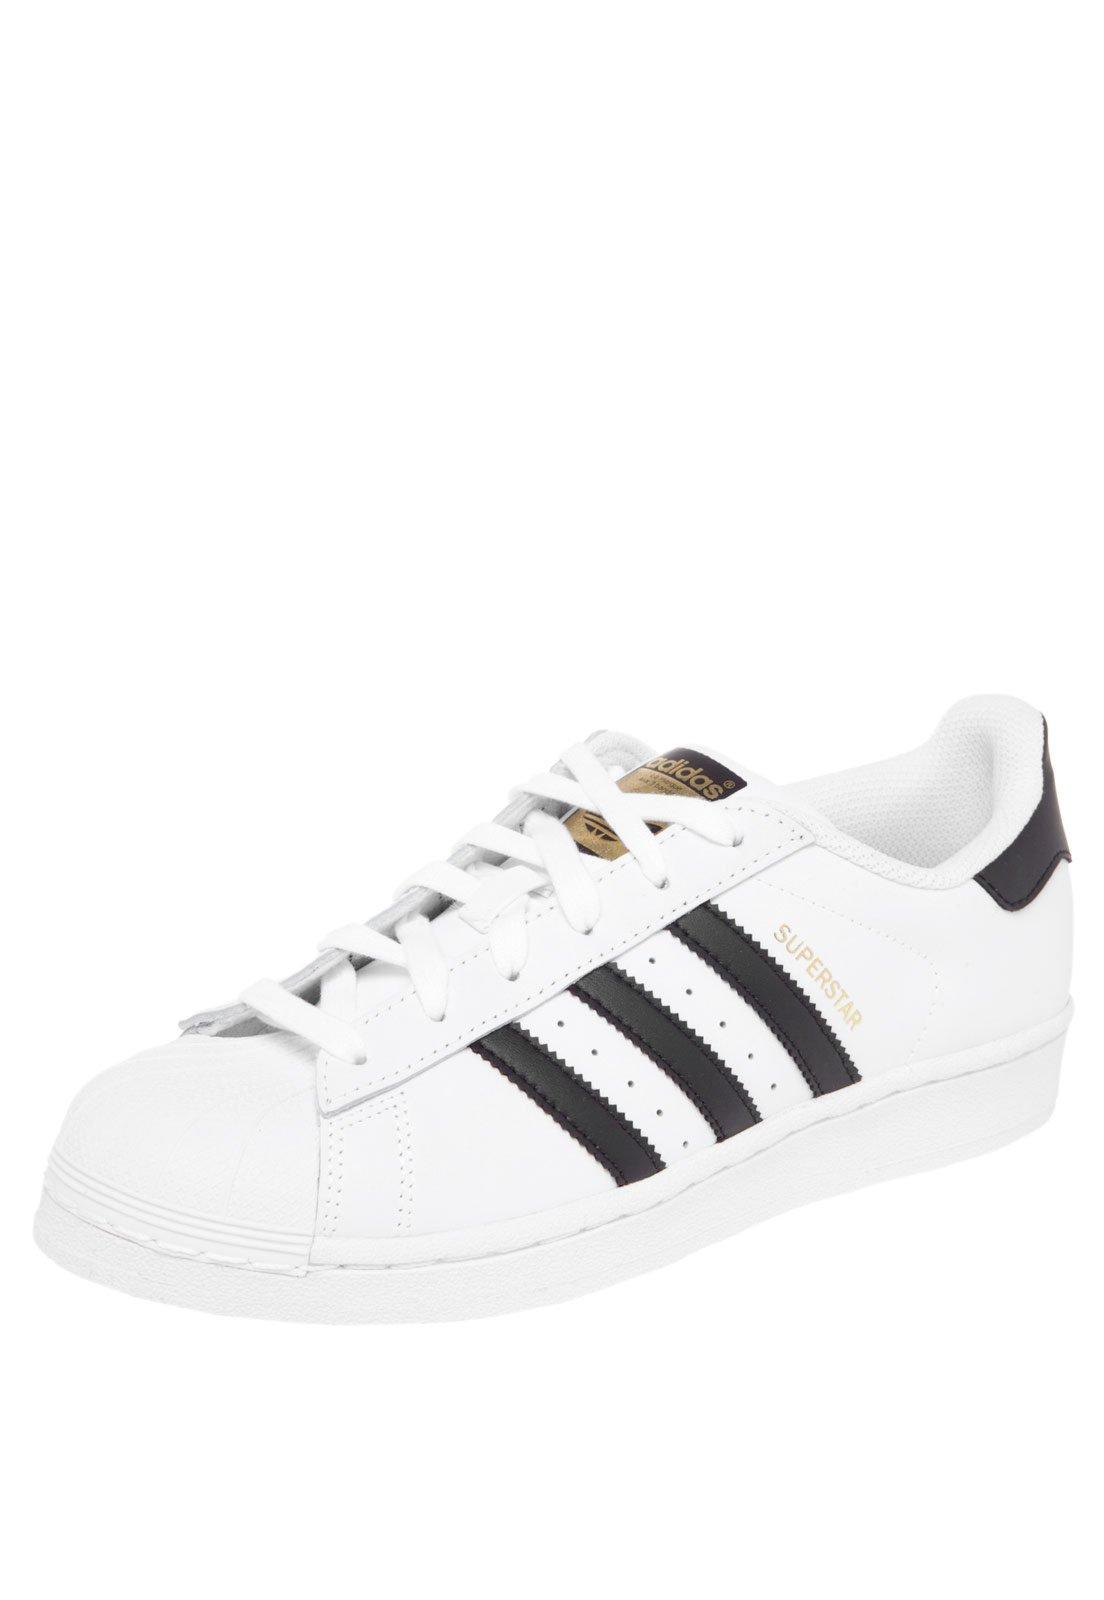 Tênis adidas Originals Superstar W Branco